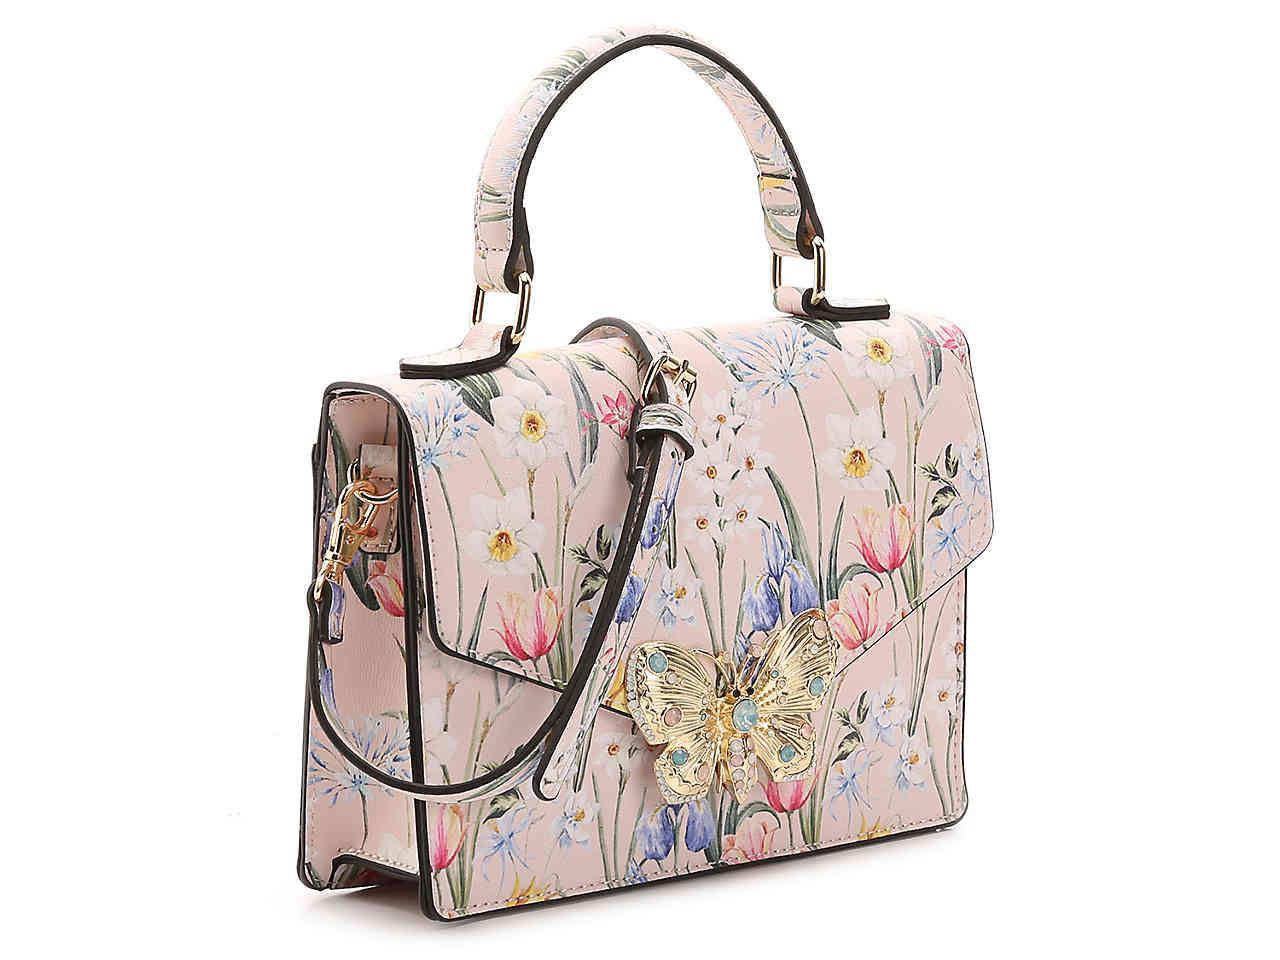 Erfly Purses And Handbags Best Purse Image Ccdbb